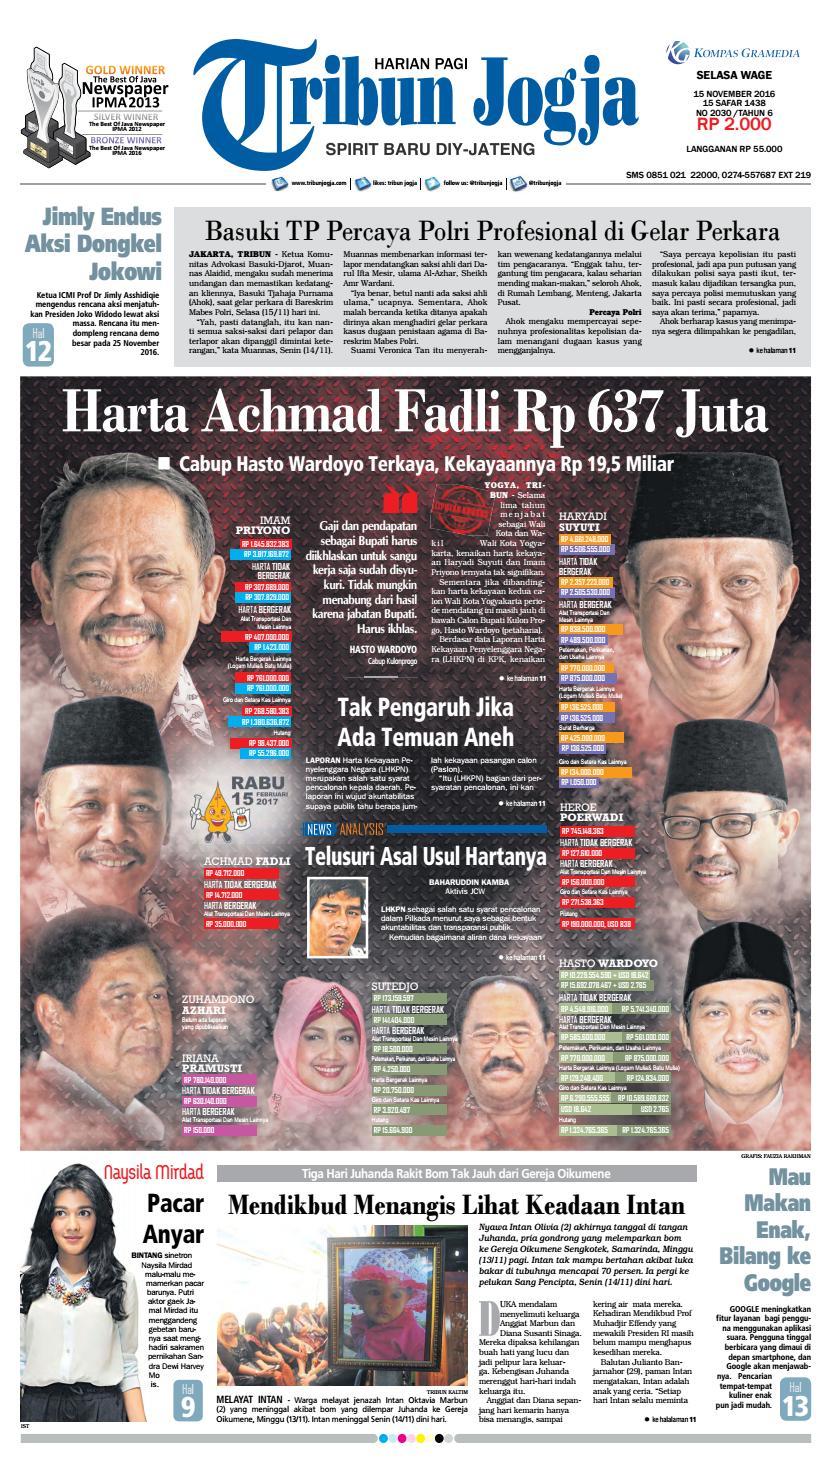 Tribunjogja 15 11 2016 By Tribun Jogja Issuu Produk Ukm Bumn Wisata Mewah Bali 3hr 2mlm